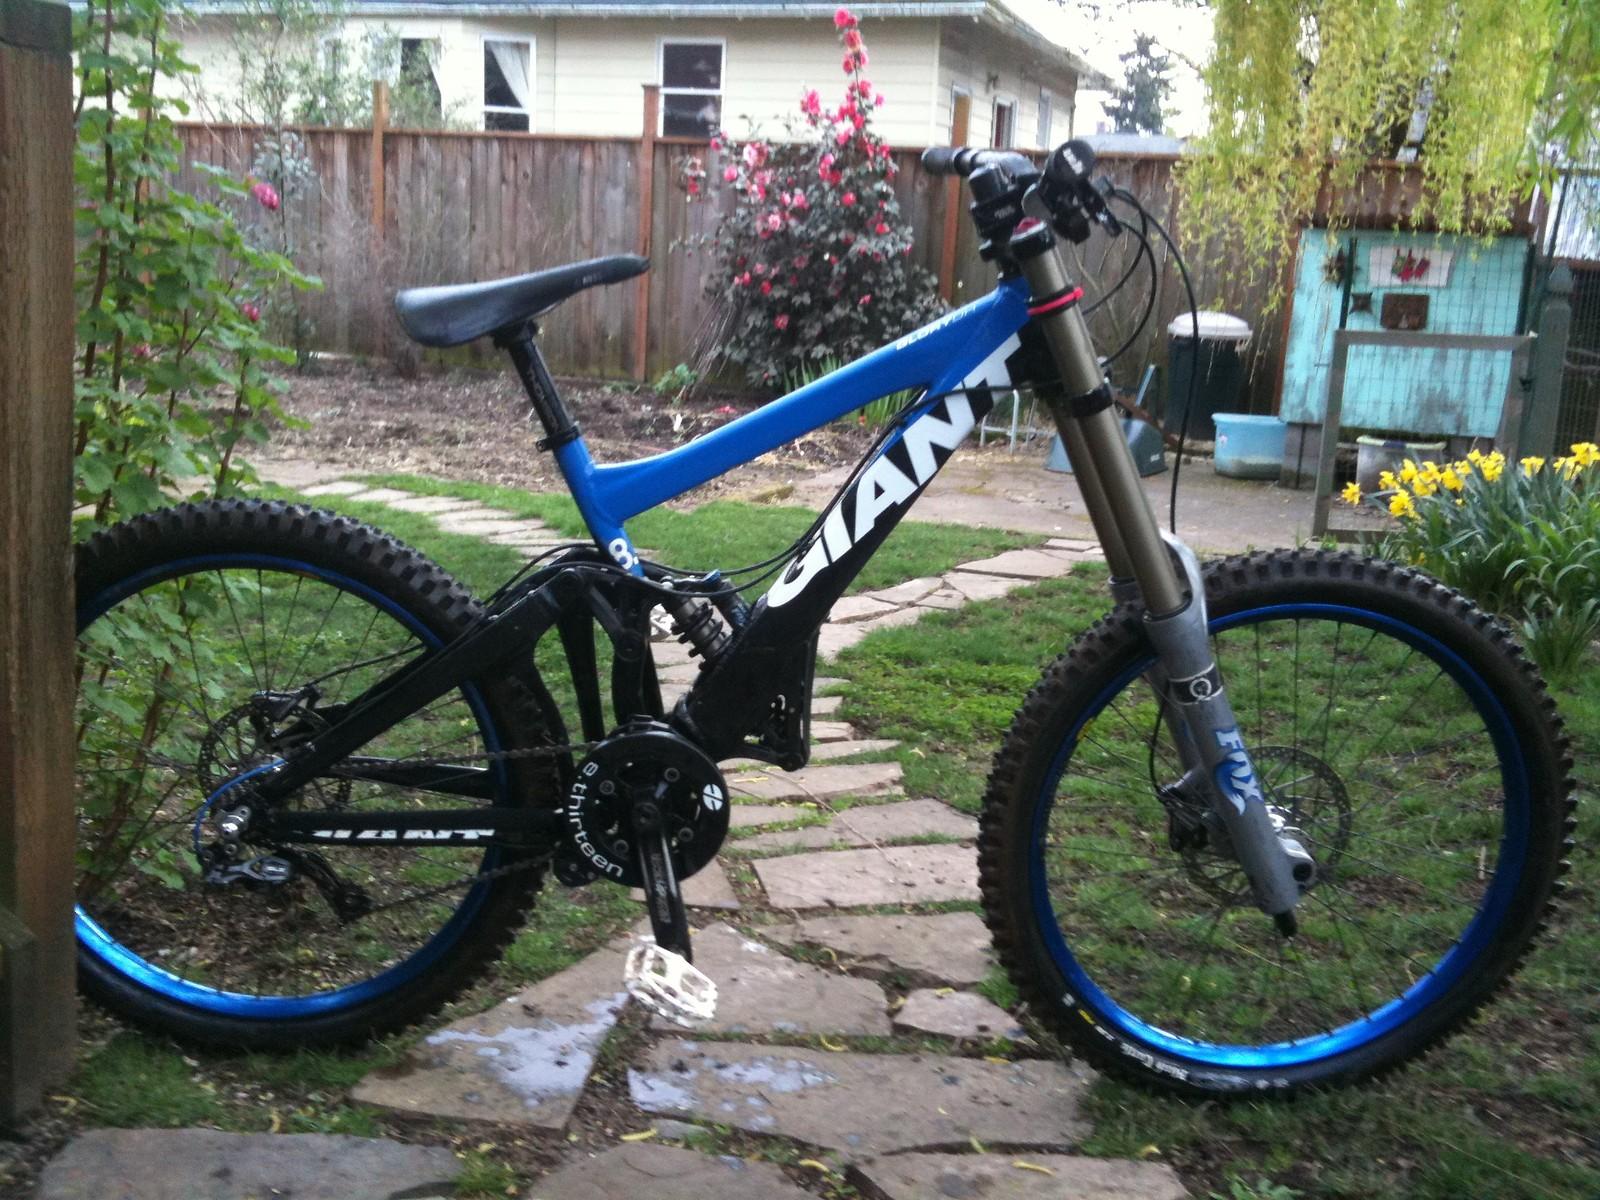 IMG_0839 - Eddy Merkin - Mountain Biking Pictures - Vital MTB